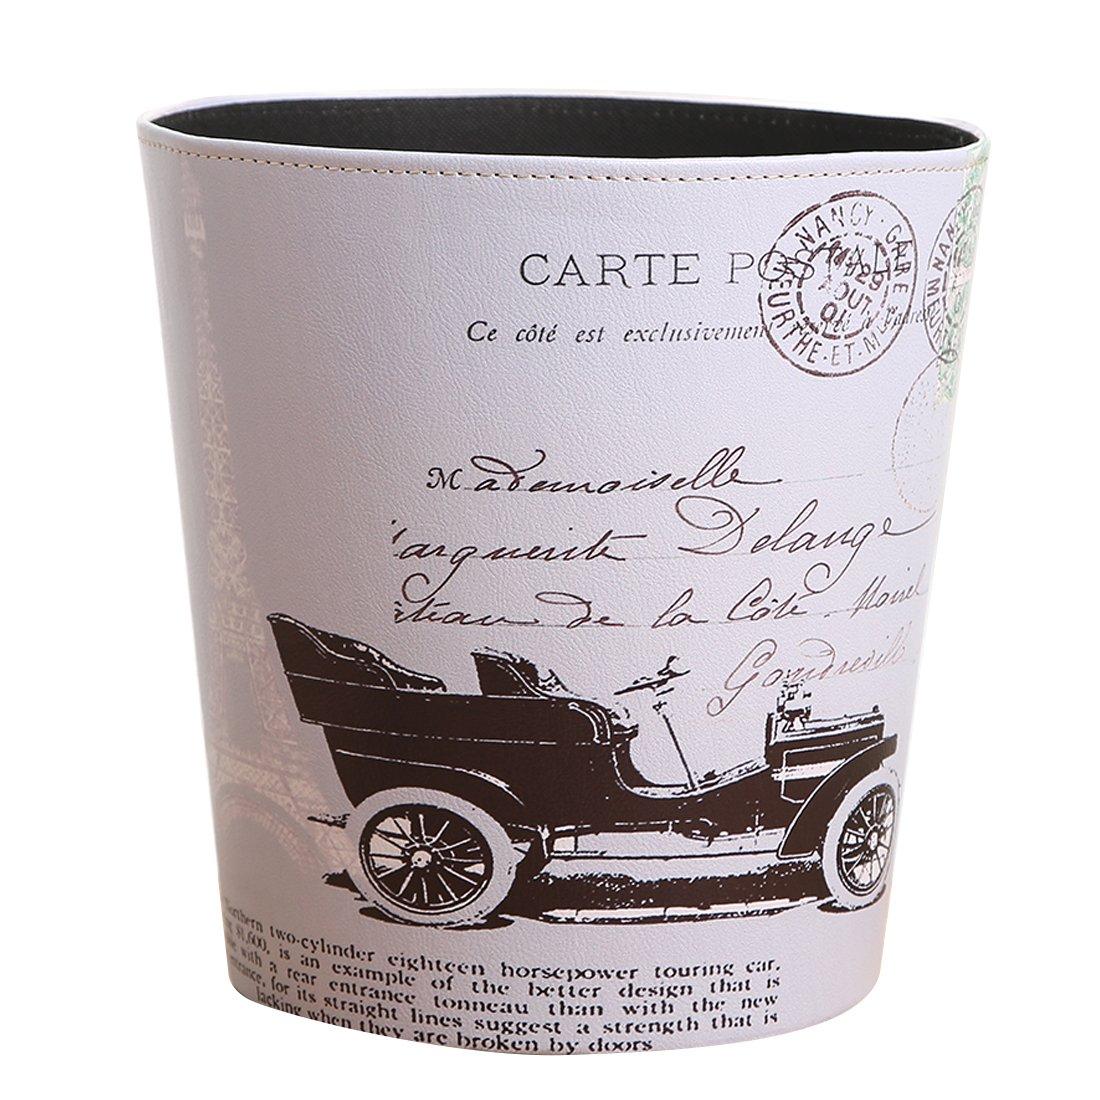 LoKauf 4.5L Vintage Waste Paper Bin Waste Paper Basket Household Trash Bin Wastebasket 19 * 19 * 19cm